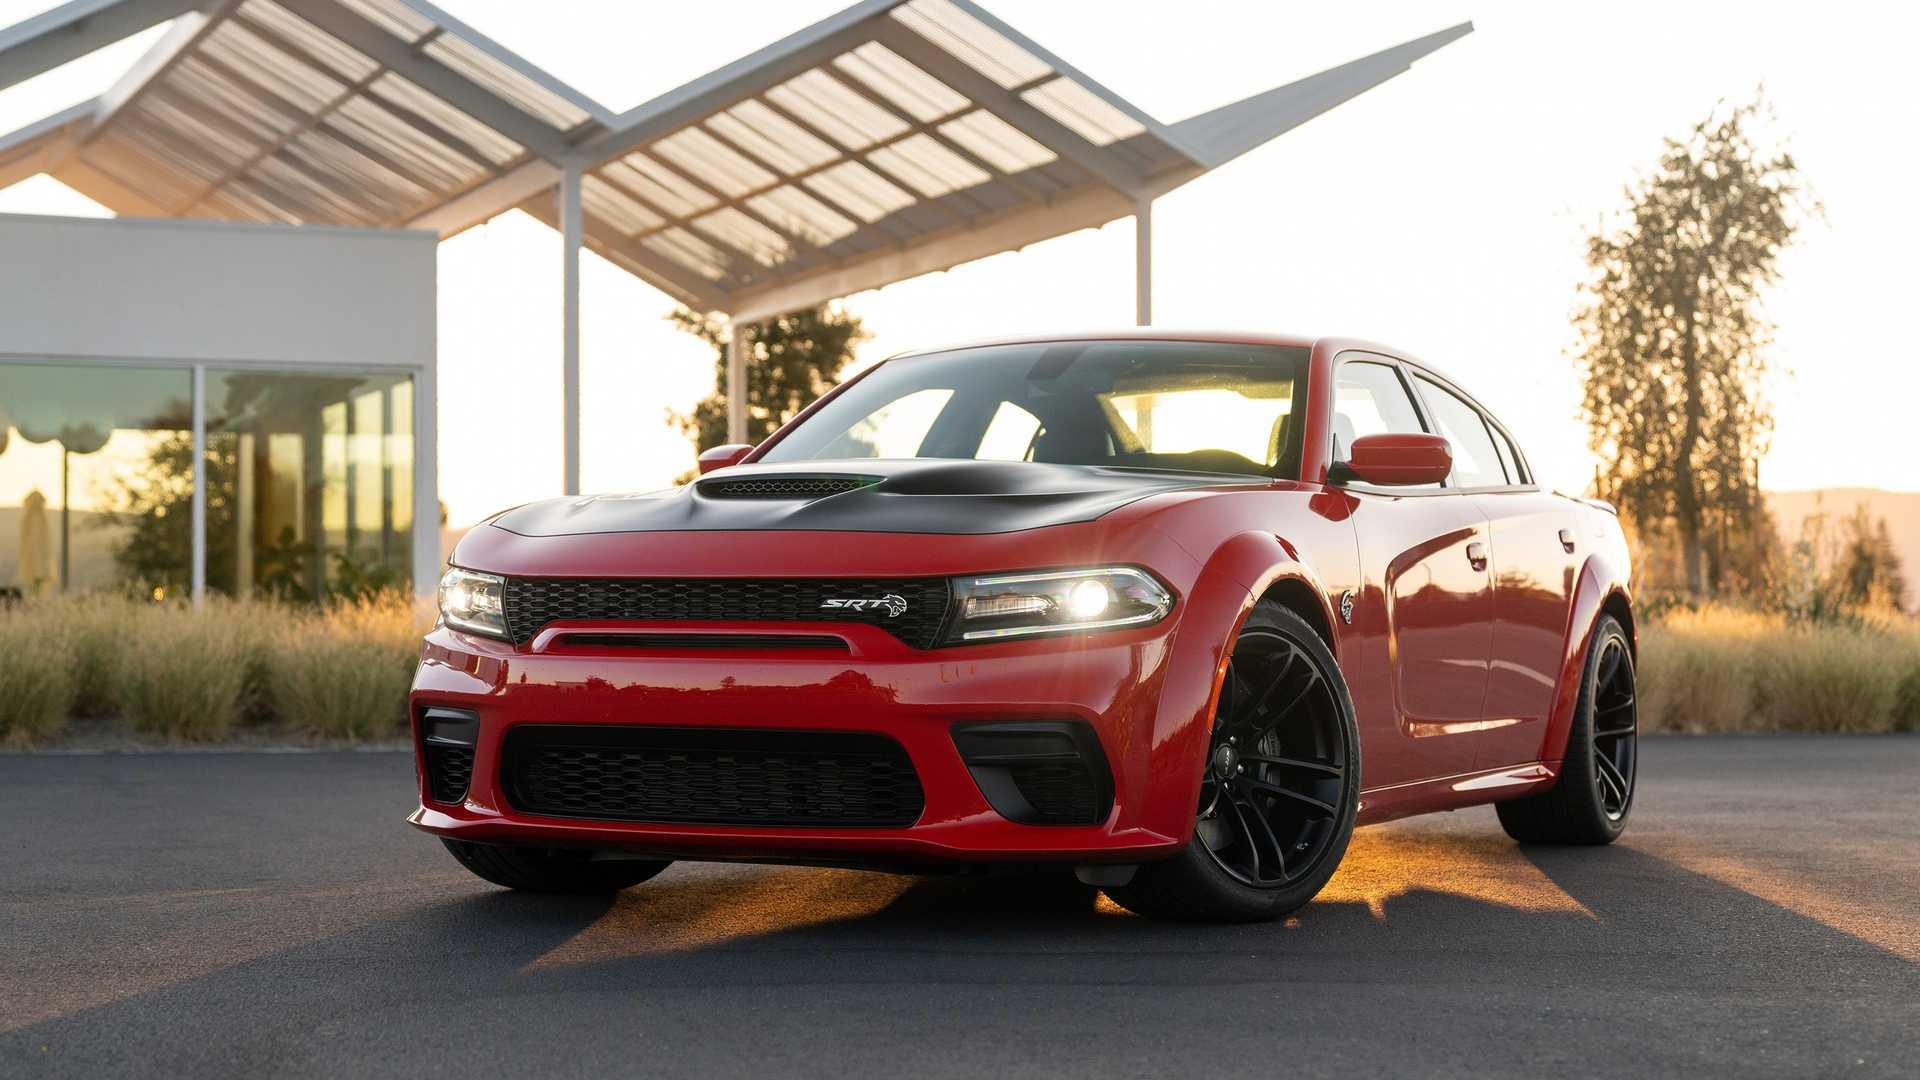 Dodge charger sedan (додж чарджер седан)